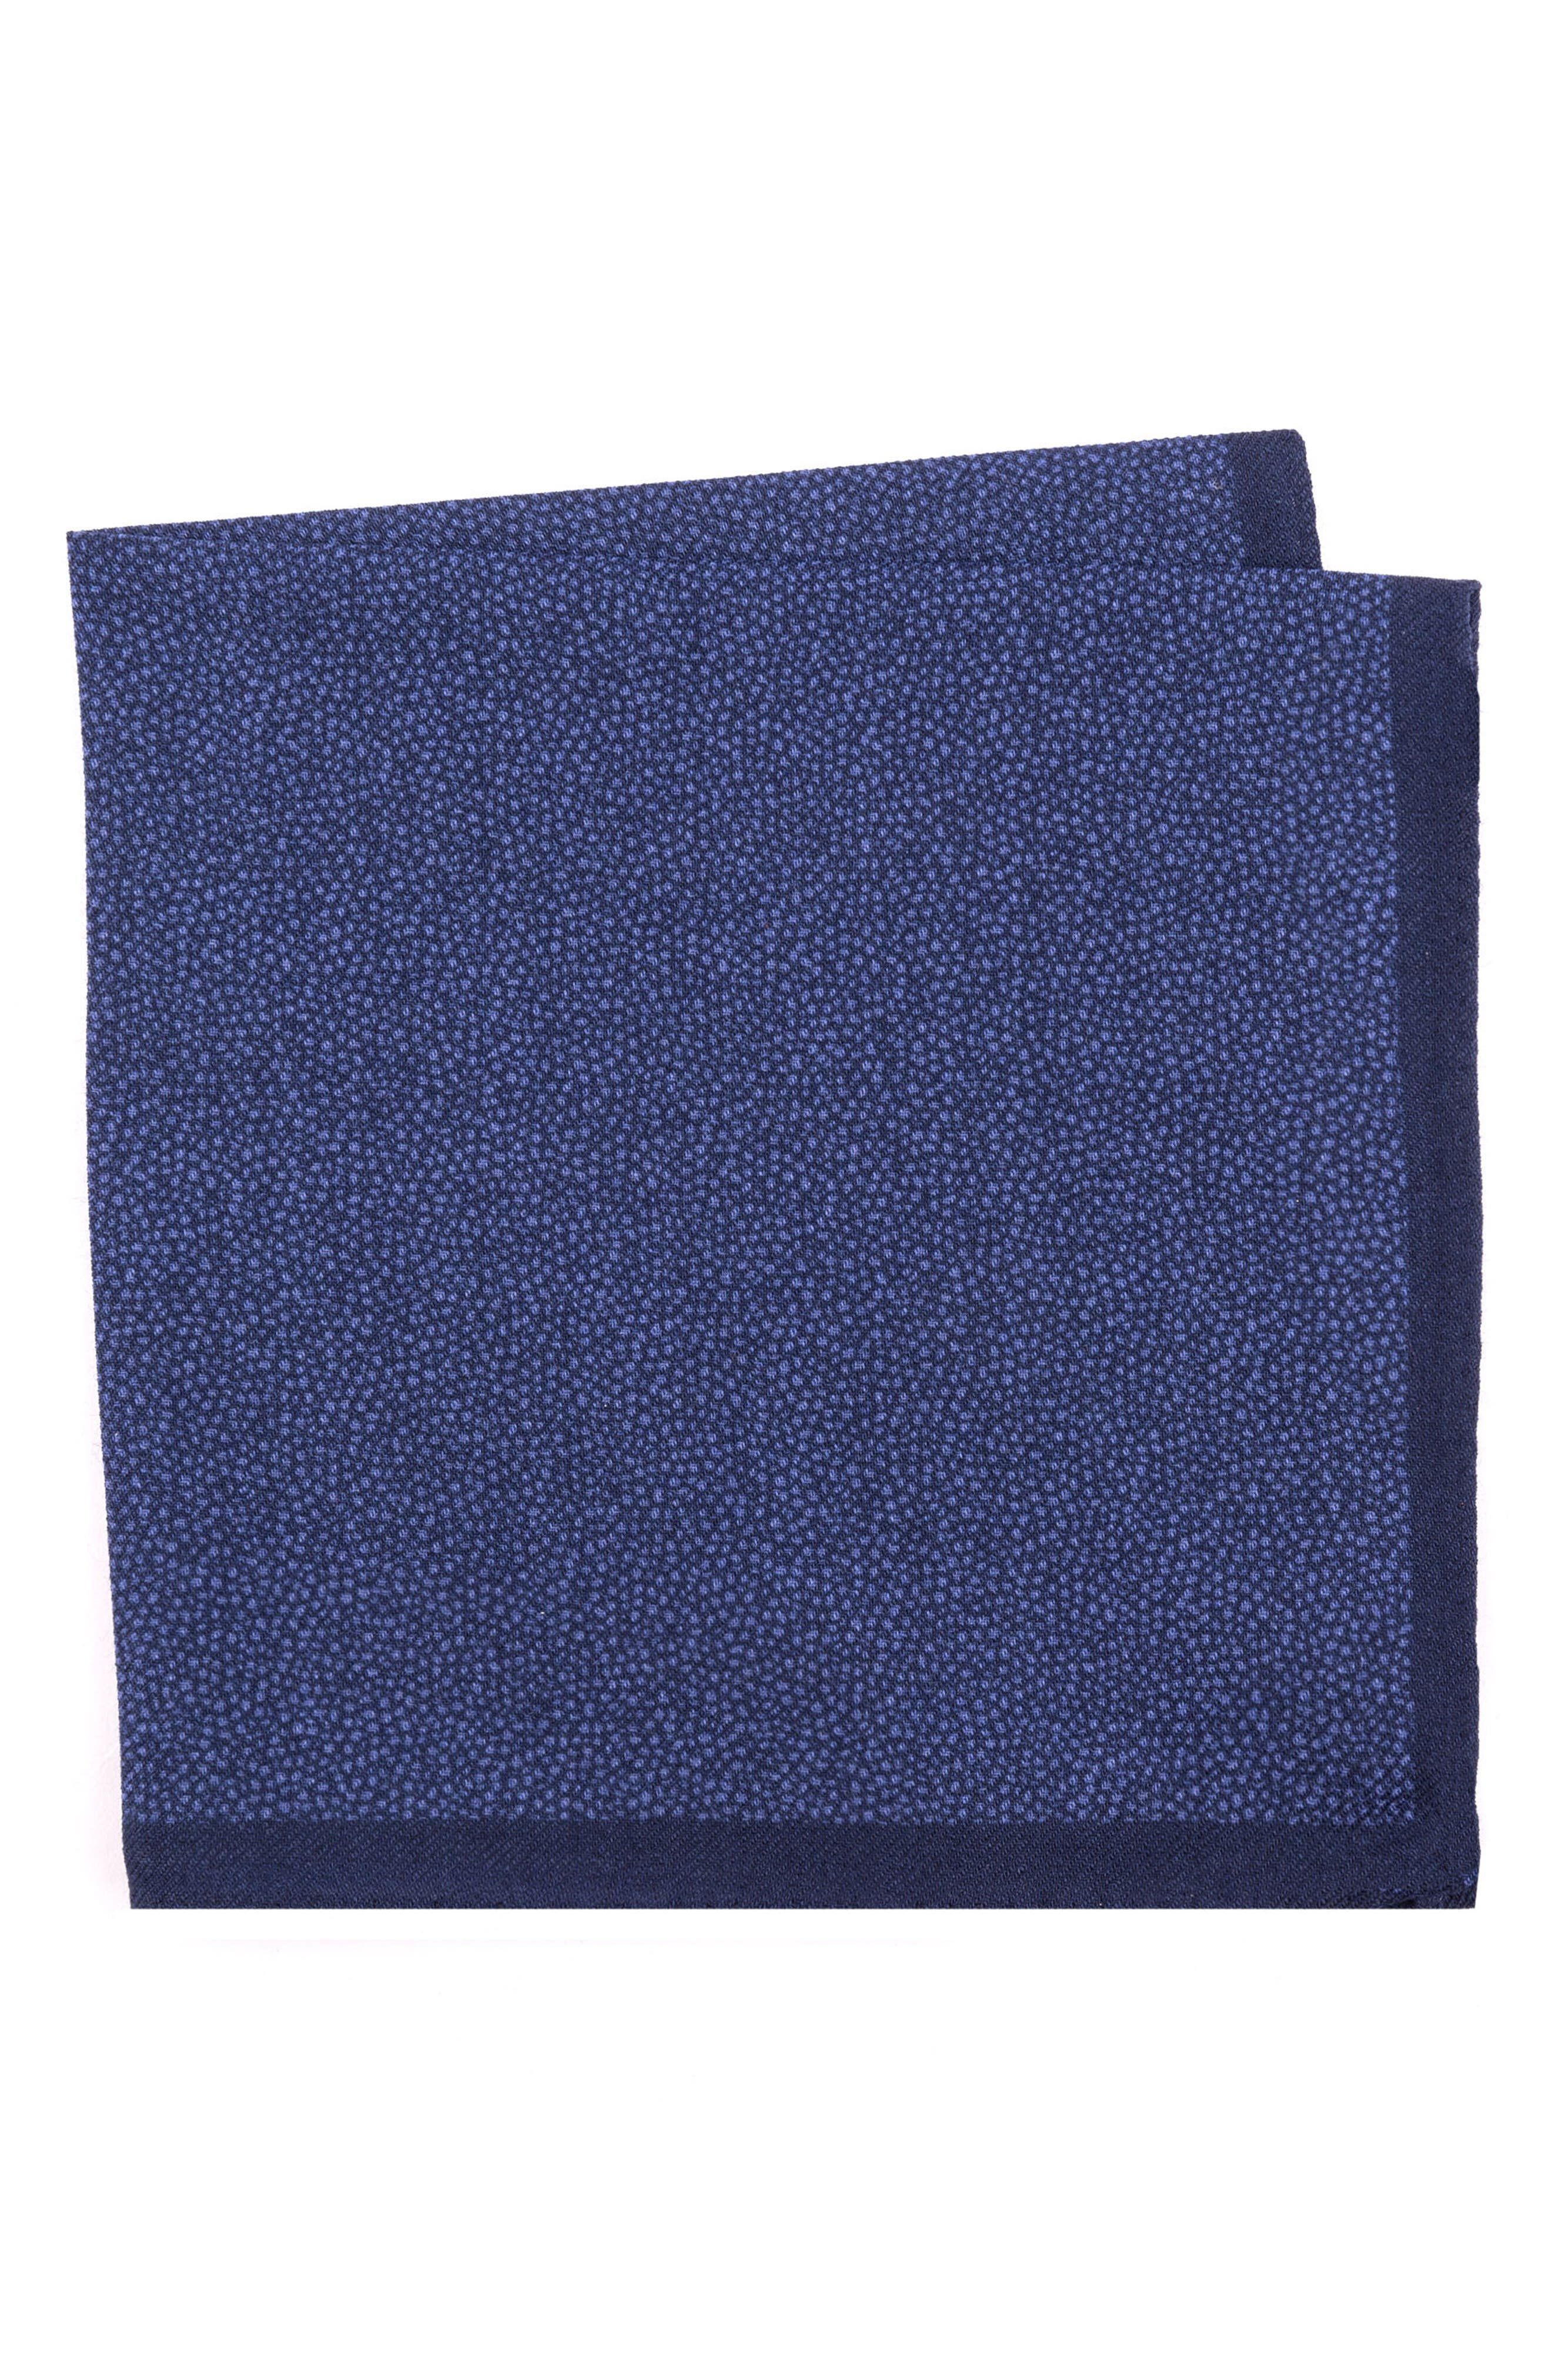 Dot Wool Pocket Square,                         Main,                         color, 400 Blue